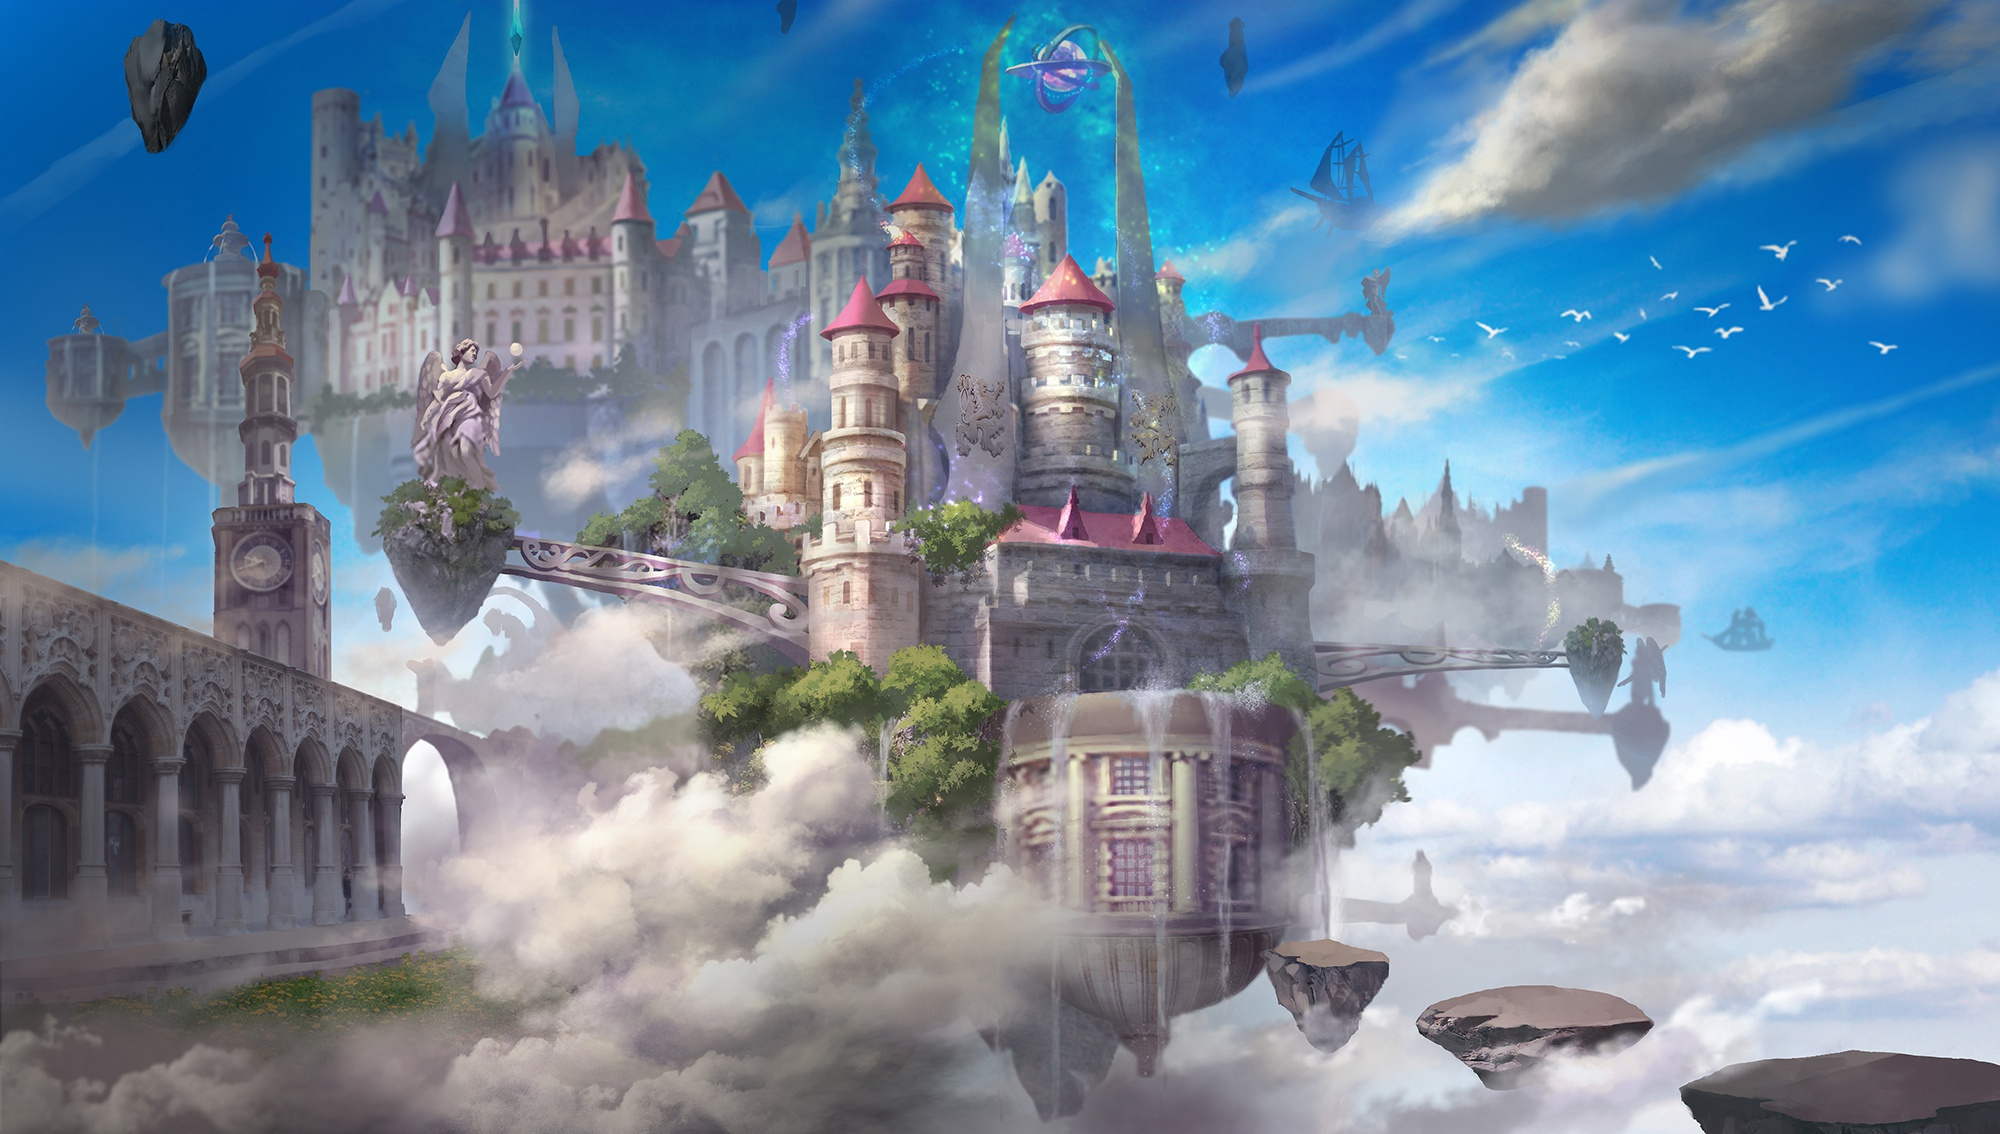 Картинка фантастического замка